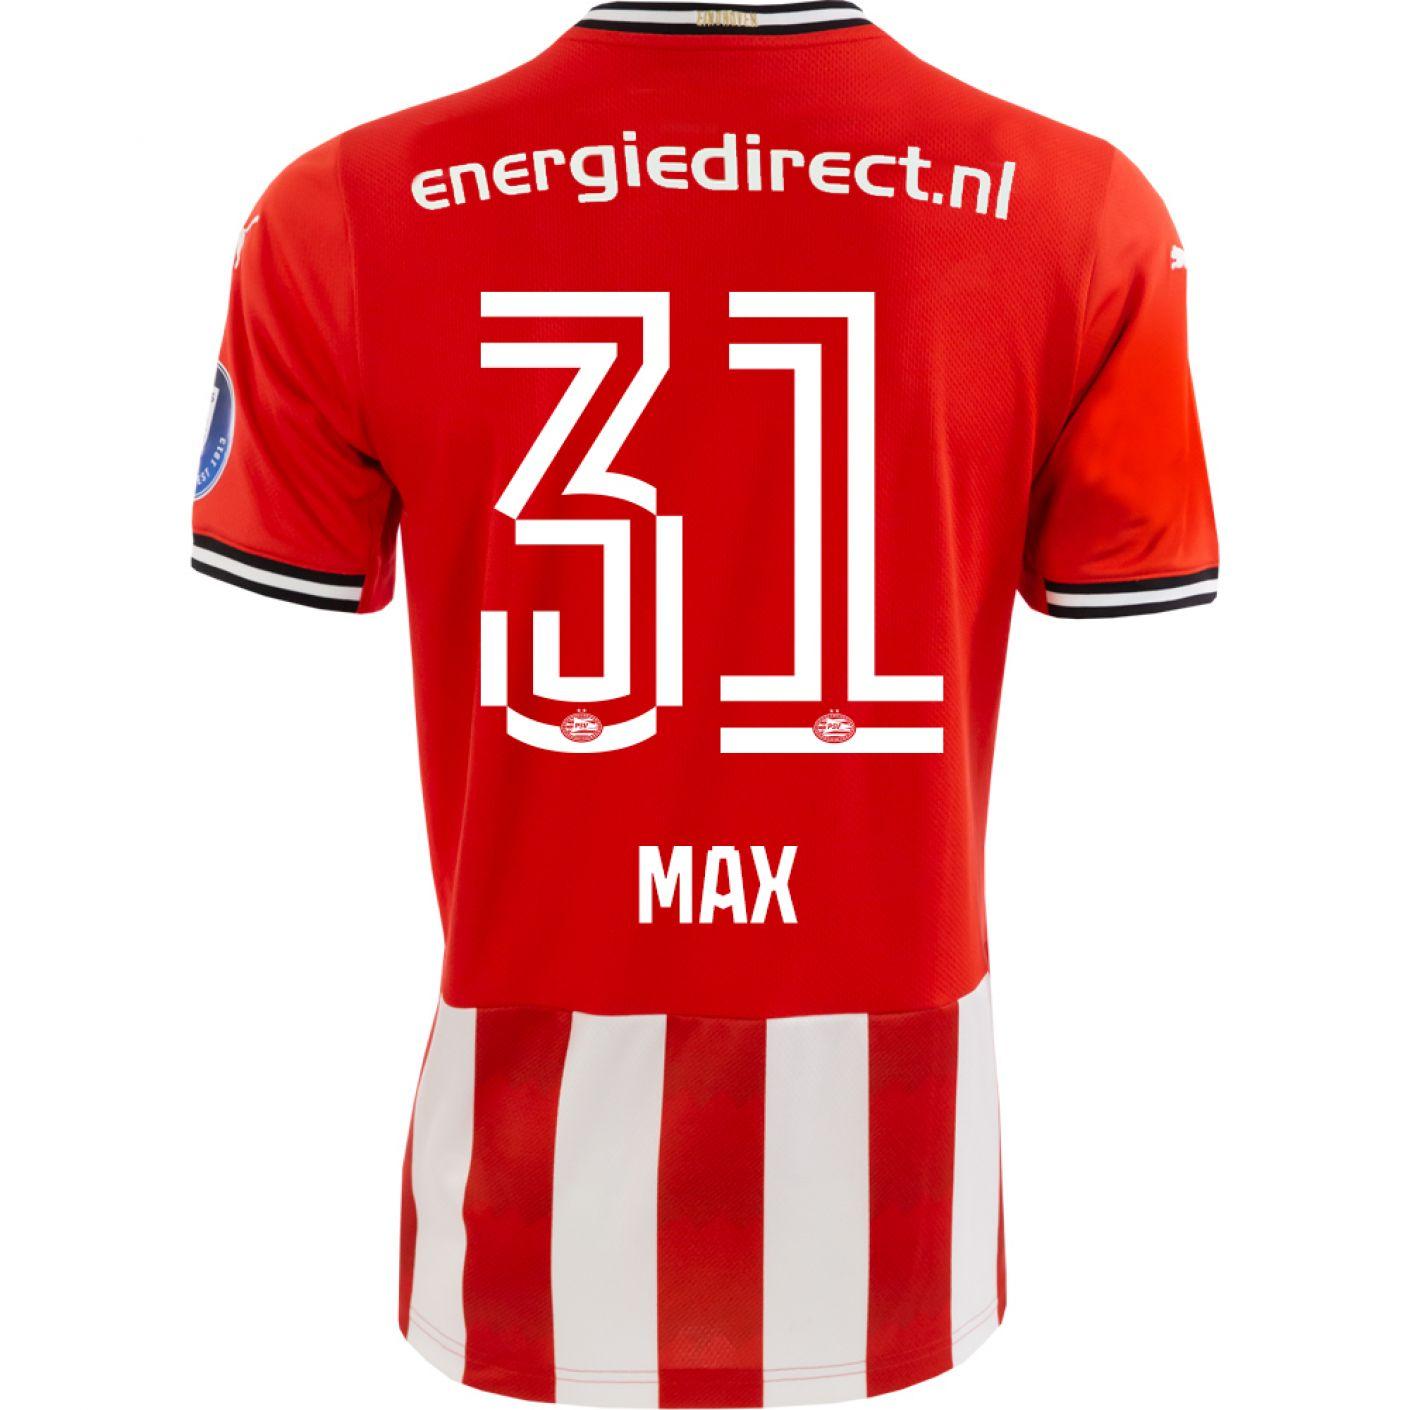 PSV Max Thuisshirt 20/21